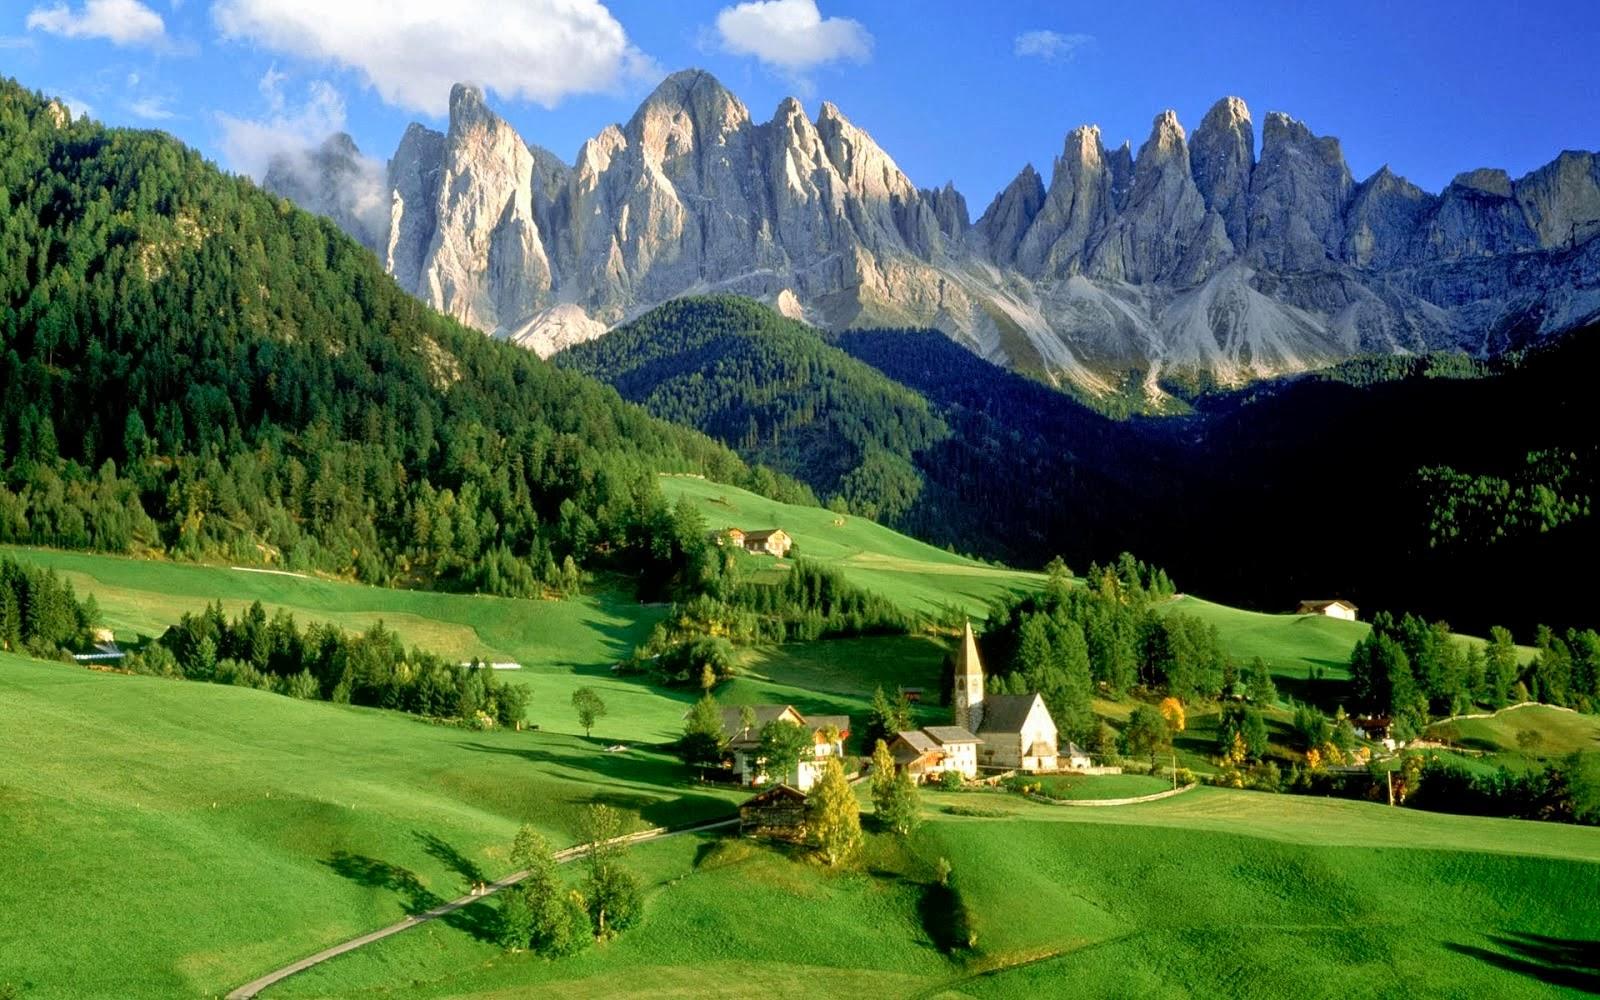 Gambar Pemandangan Alam Terindah di Dunia Puncak Gung Bukit Hijau Cantik